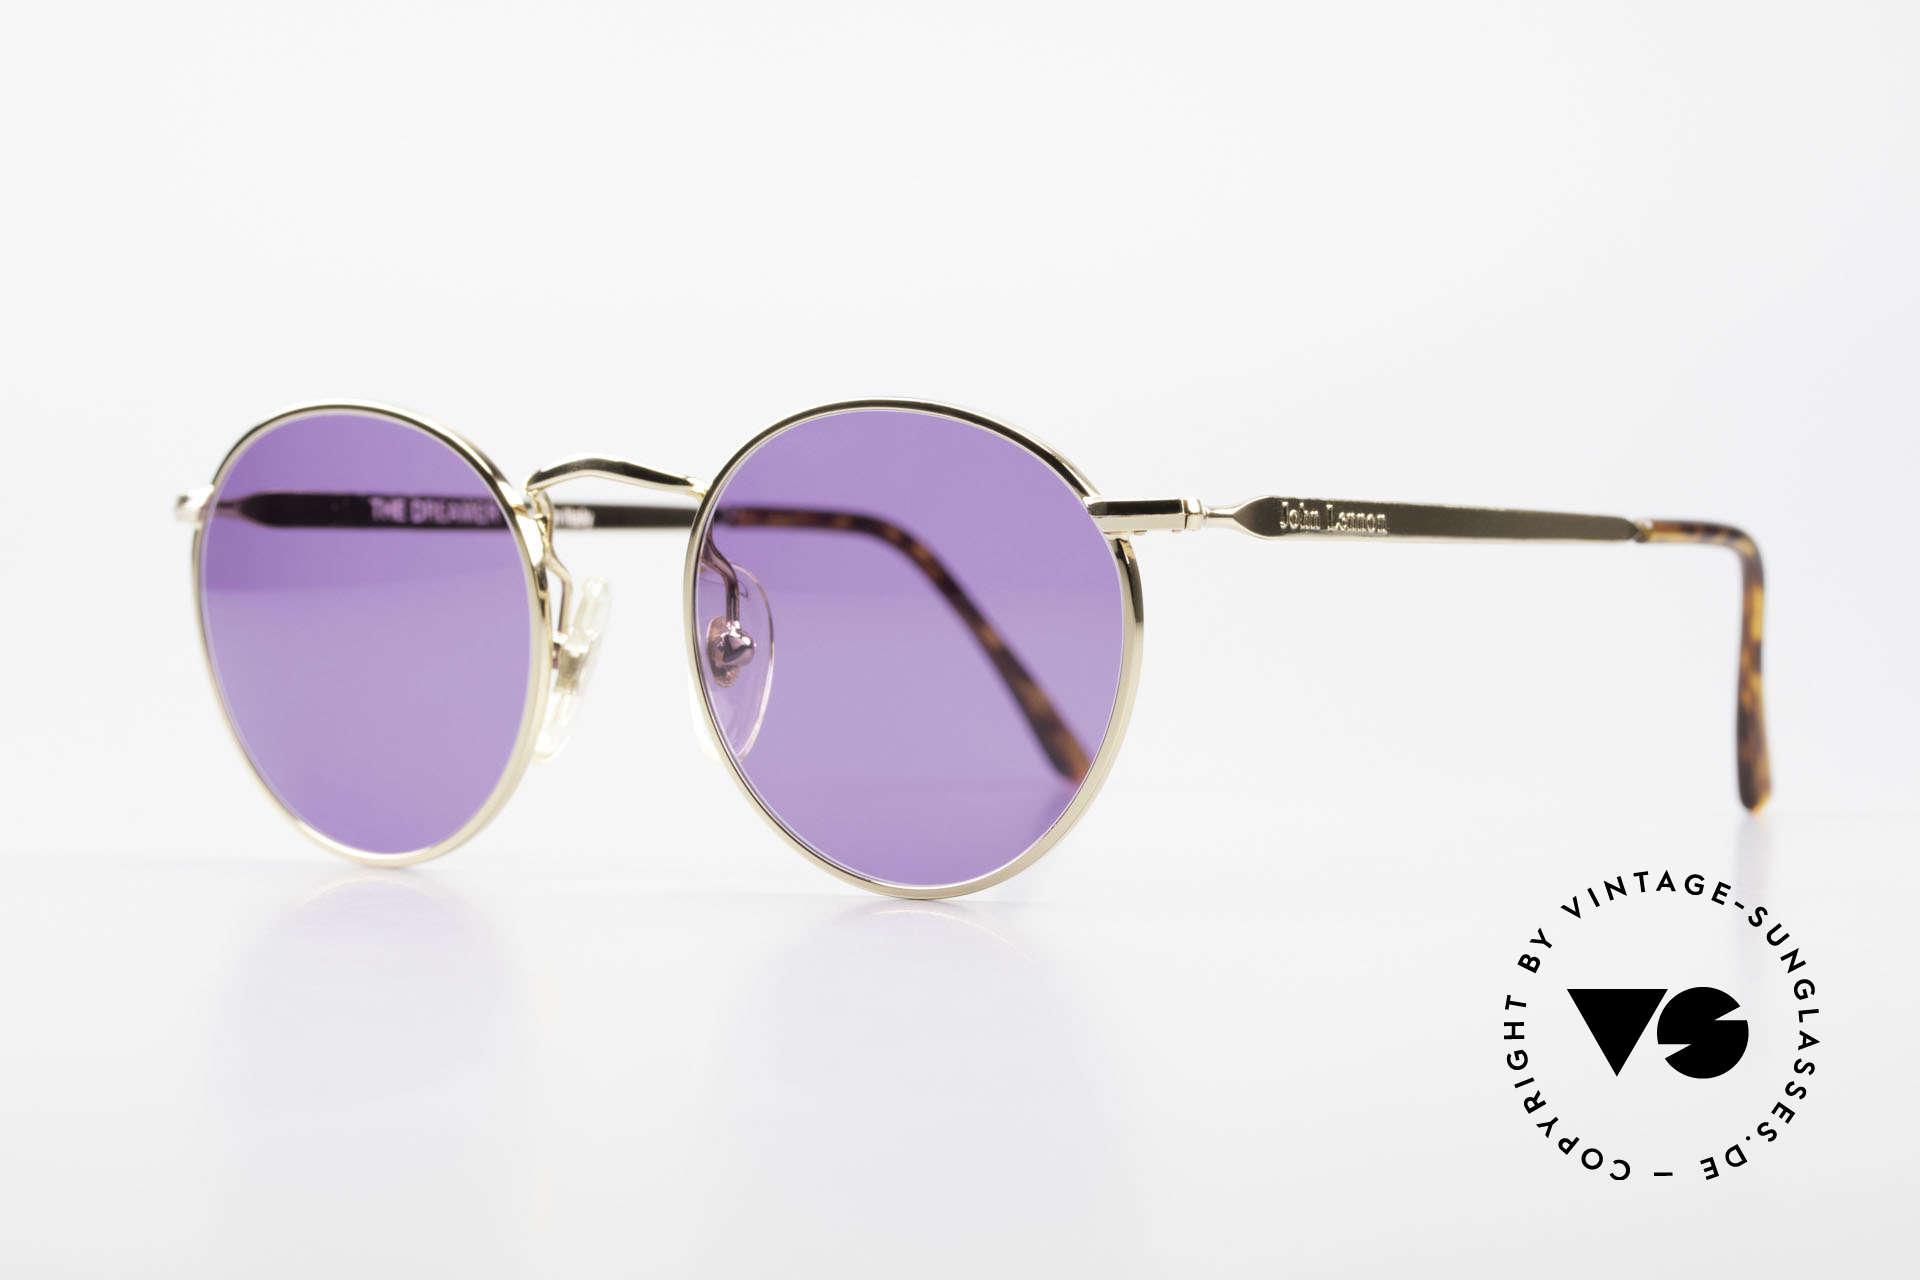 John Lennon - The Dreamer Extra Small Panto Sunglasses, all models named after famous J.Lennon / Beatles songs, Made for Men and Women